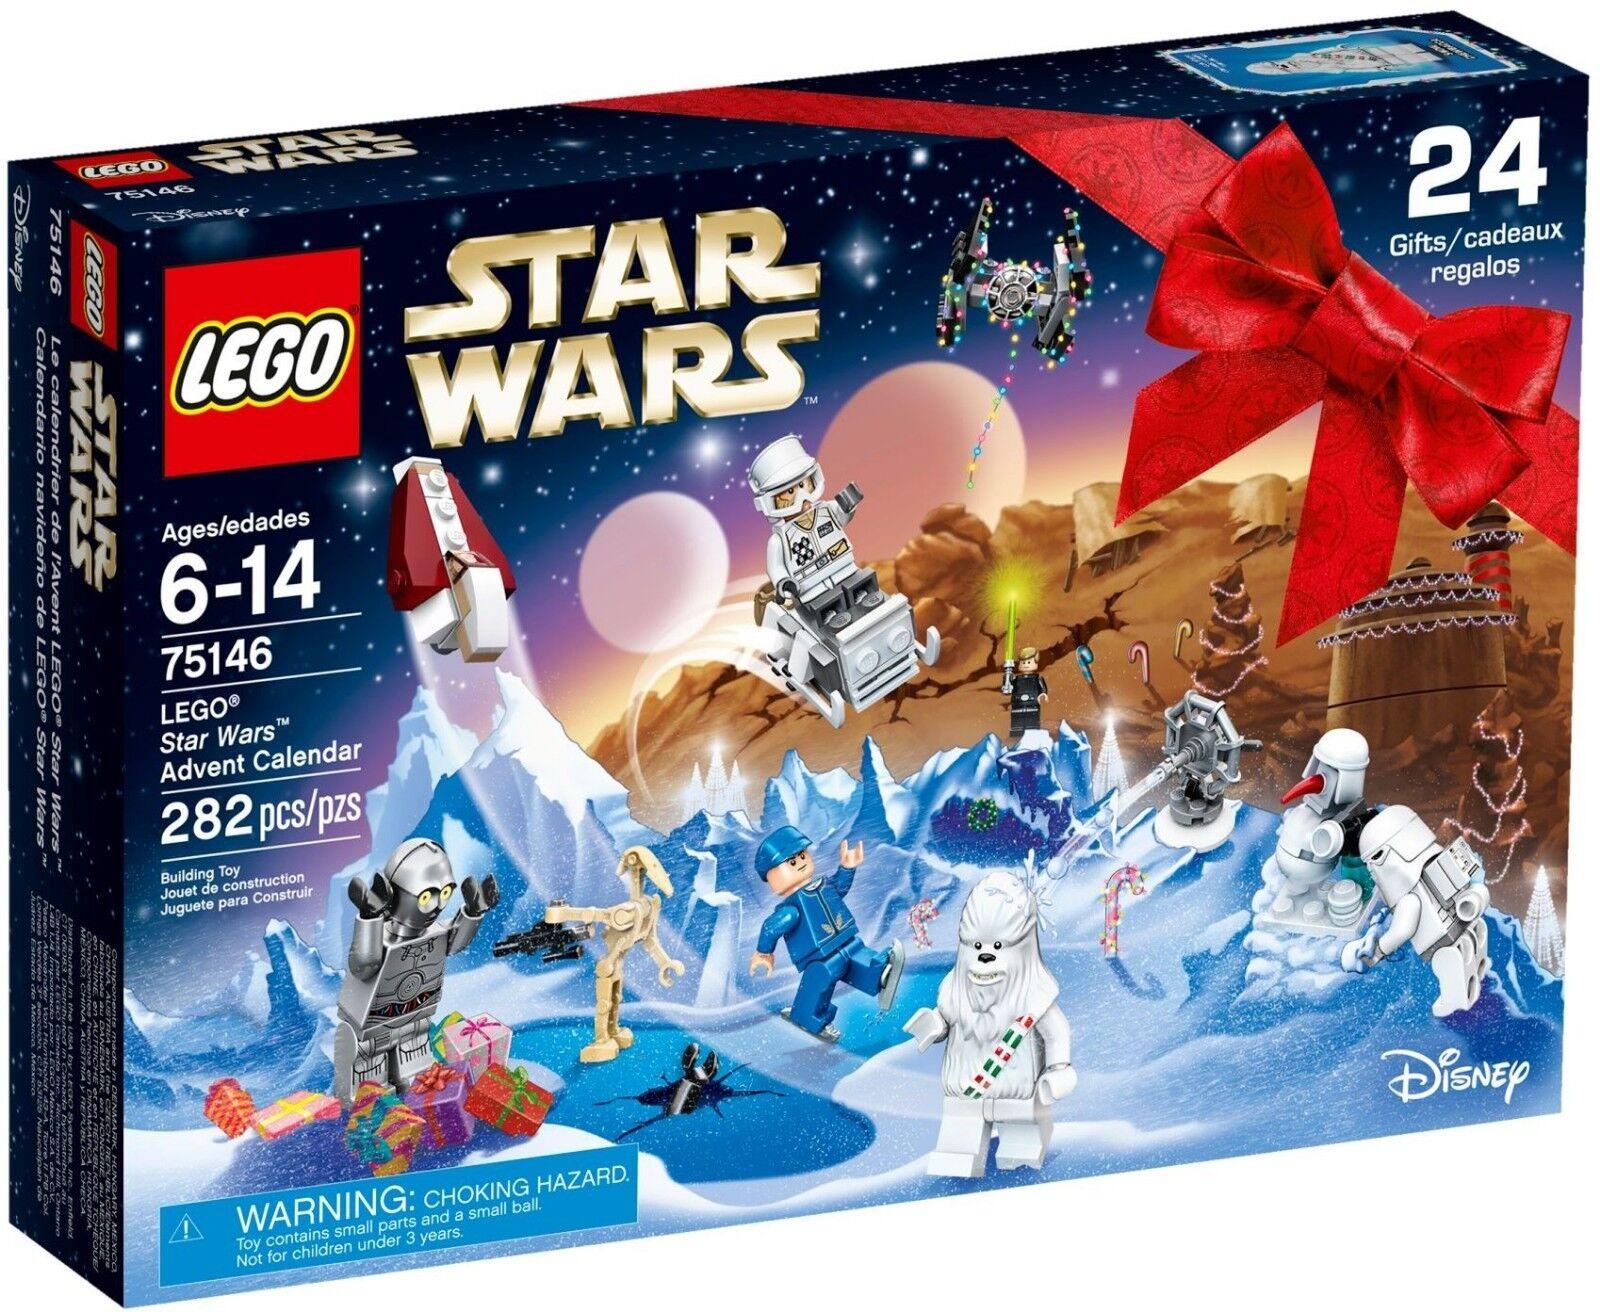 LEGO Star Wars 75146 2016 Advent Calendar Brand Nuovo in Sealed Box  Retirosso